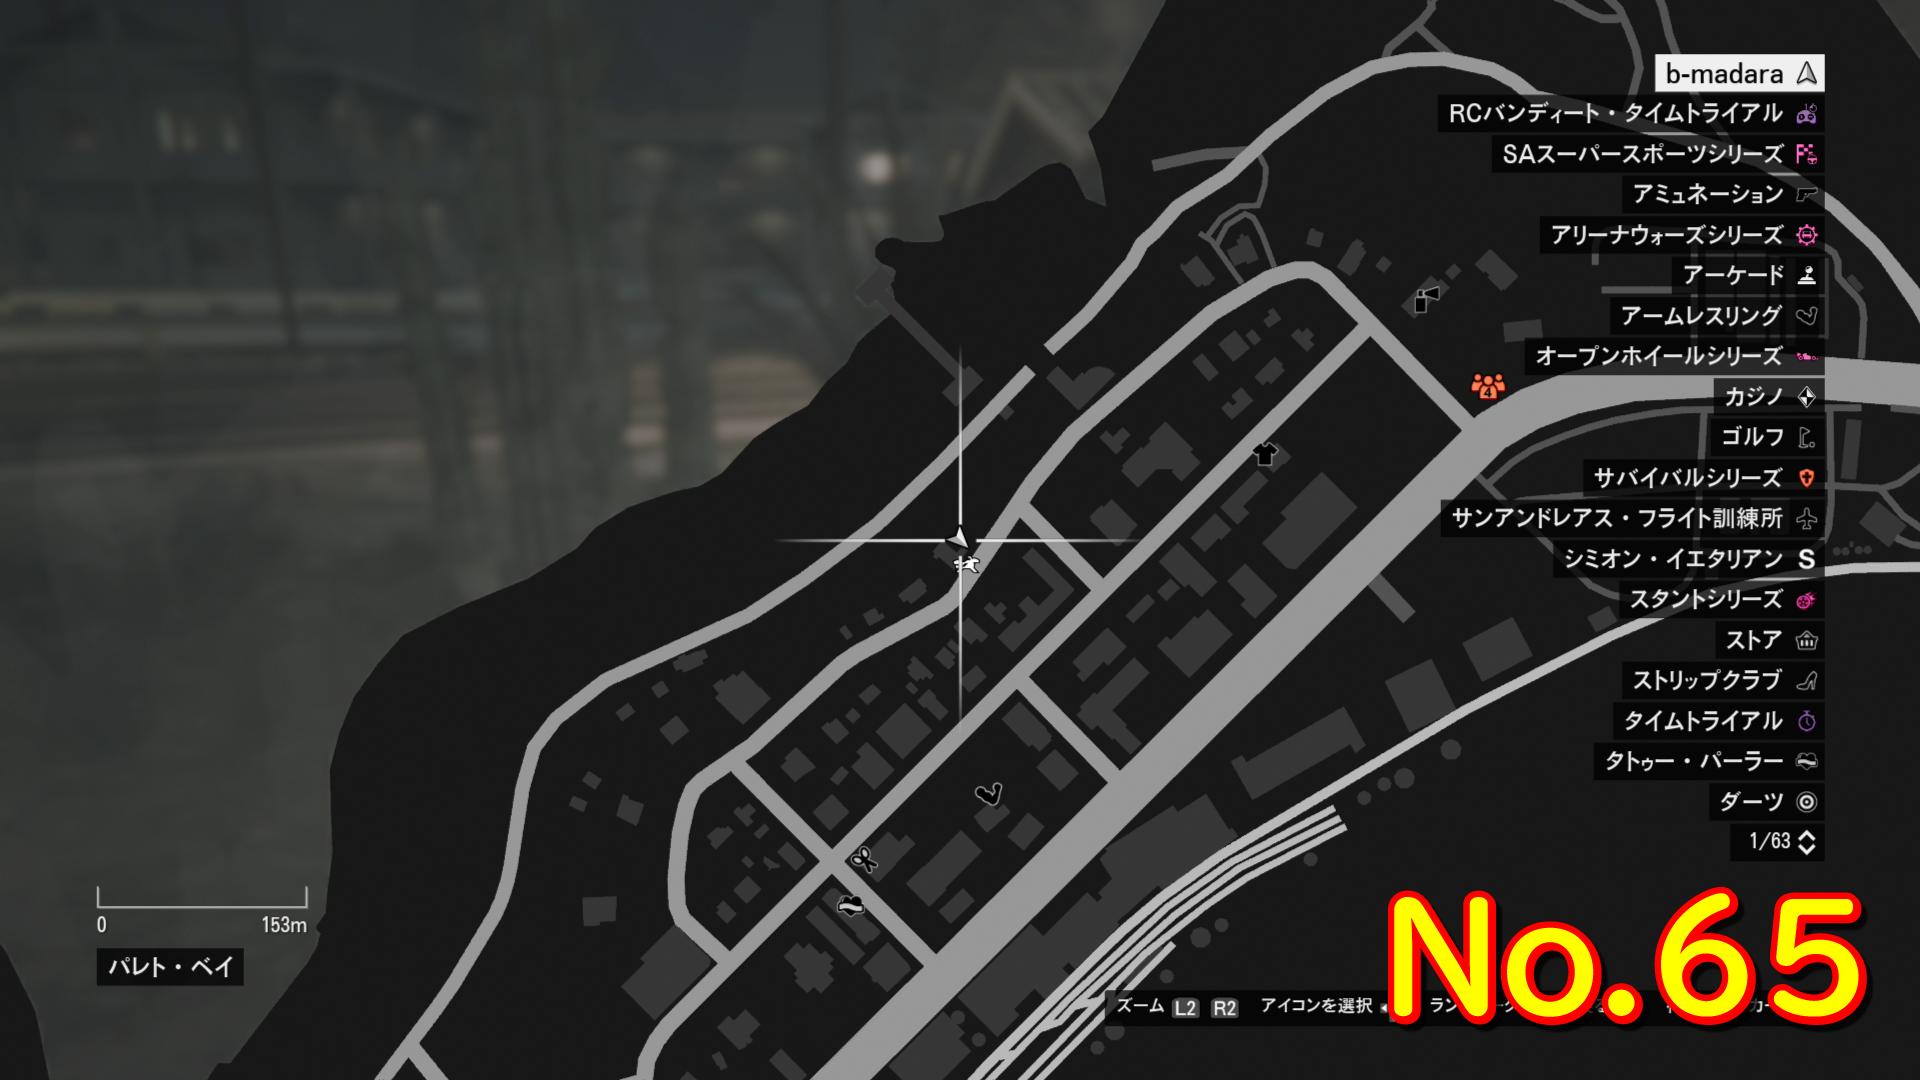 GTA5オンライン ペヨーテプラント全76個の場所